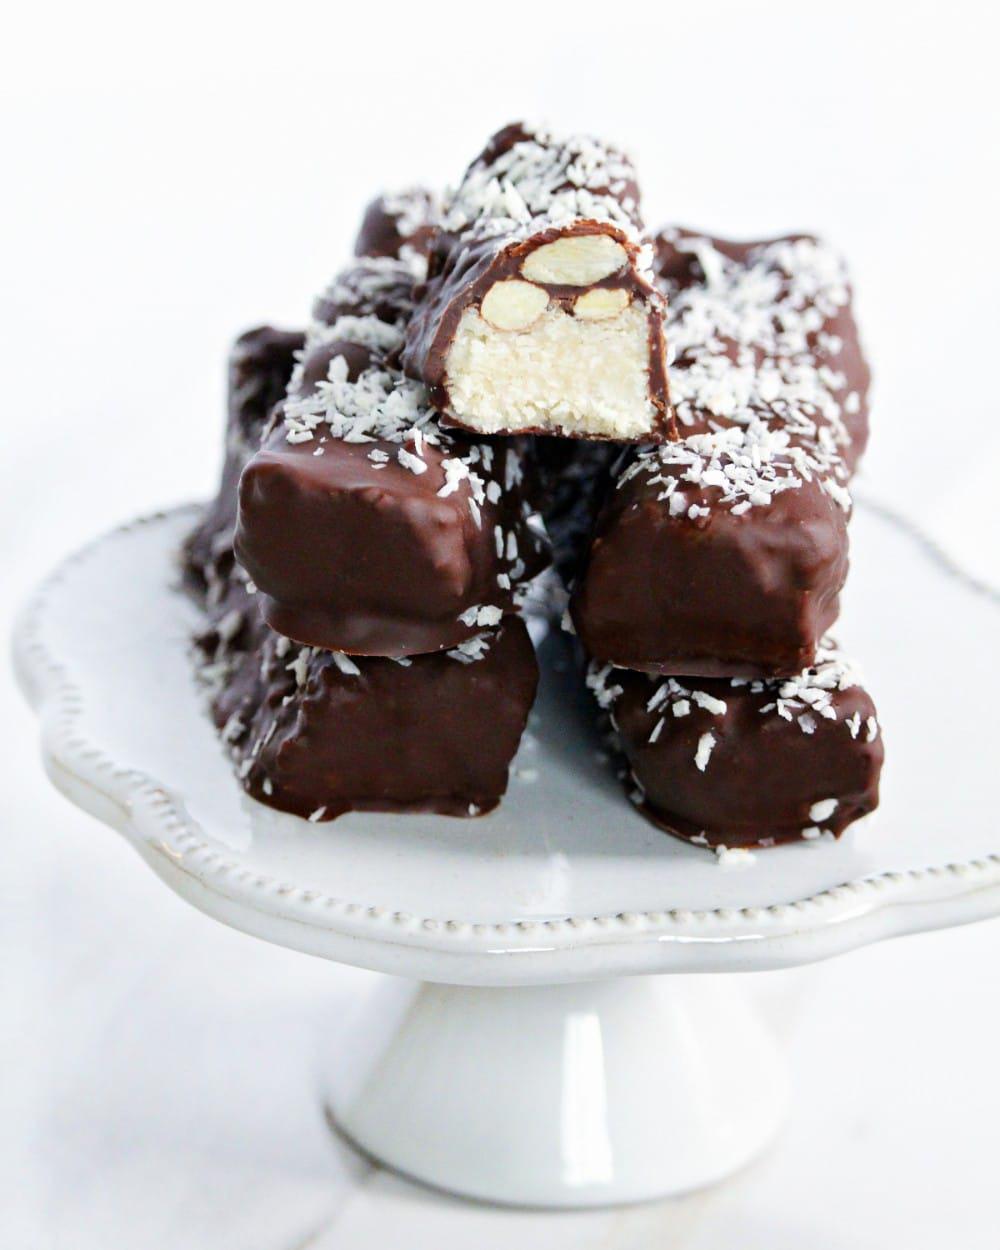 Vegan Almond Joy Bars Recipe   Vegan Dessert   World of Vegan   #almond #dessert #candy #bar #coconut #almonjoy #vegan #worldofvegan